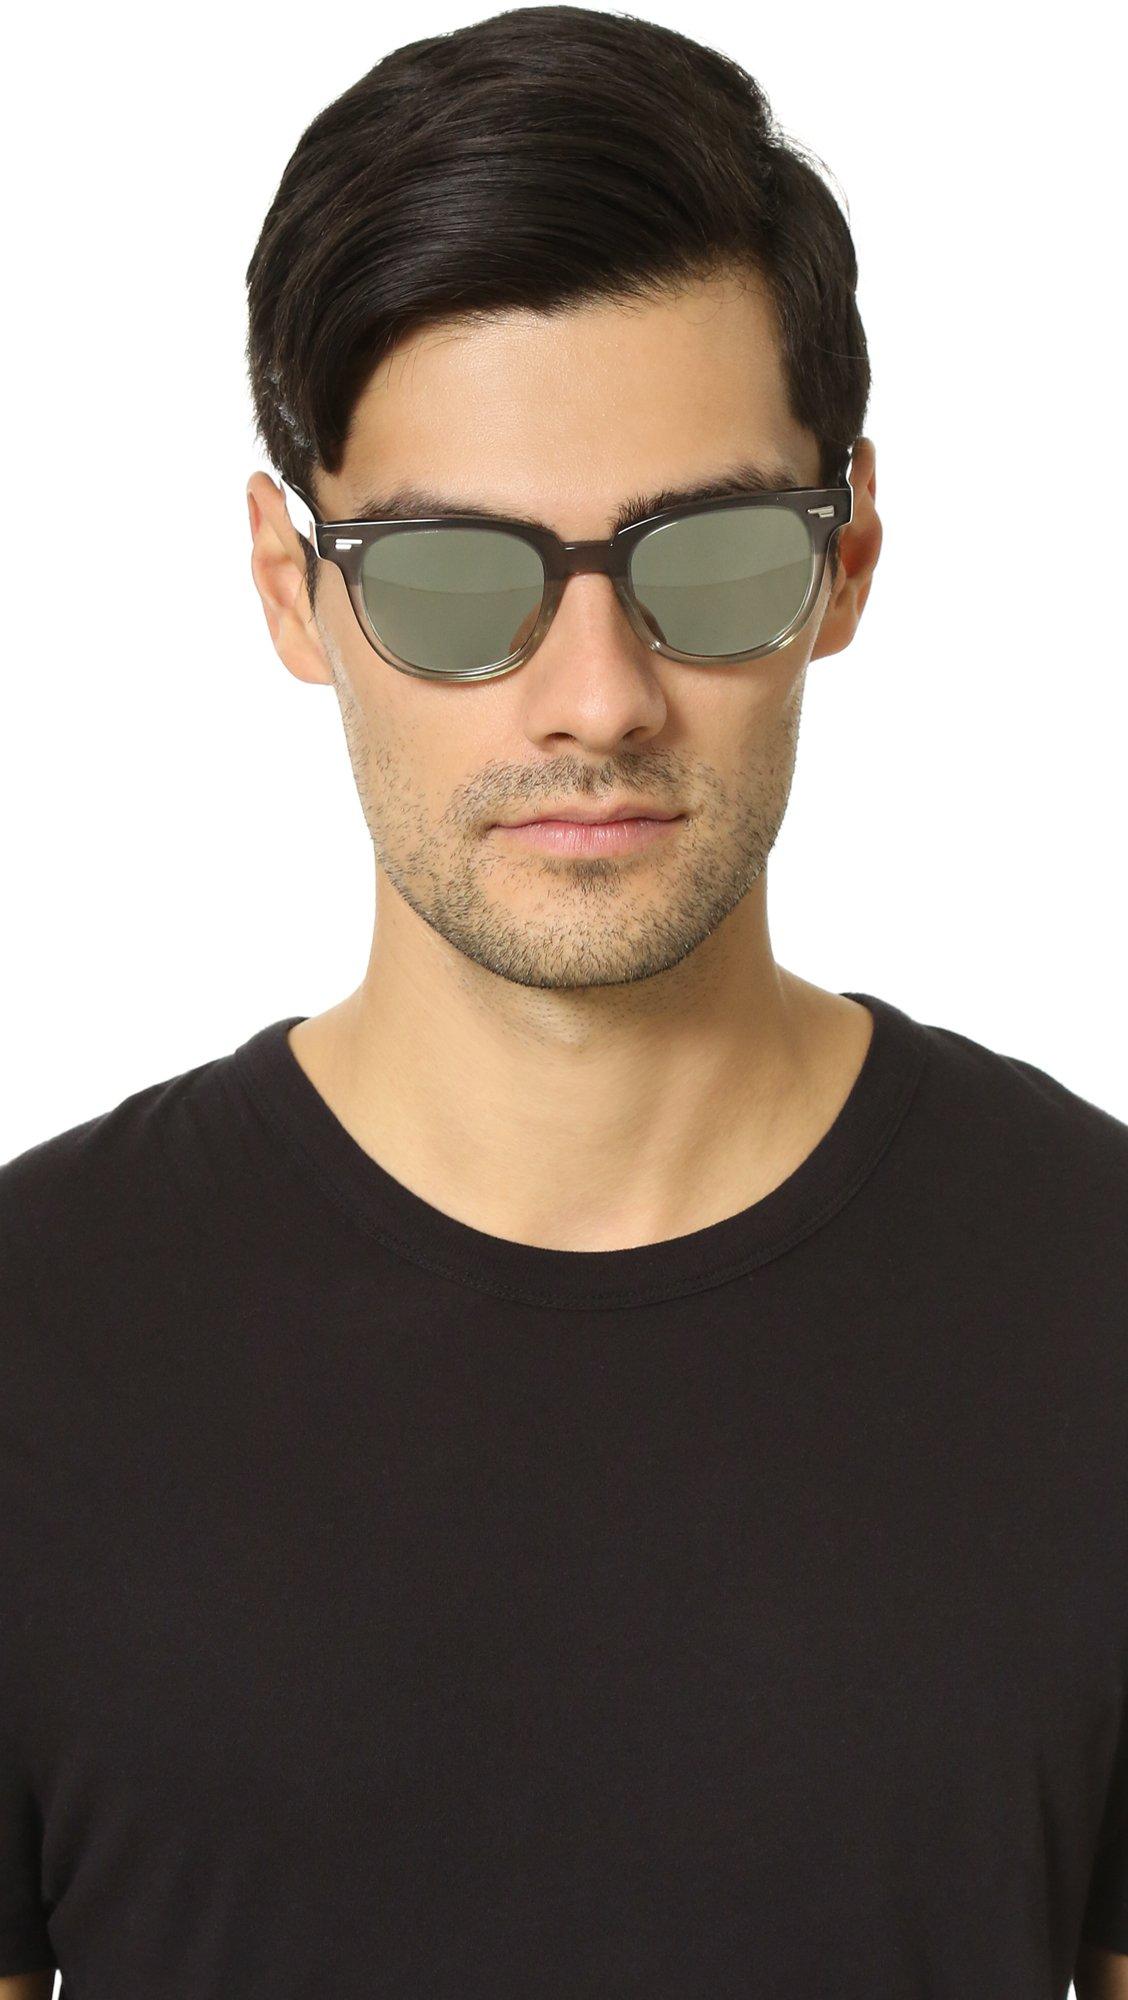 Lyst Oliver Peoples Masek Sunglasses In Metallic For Men